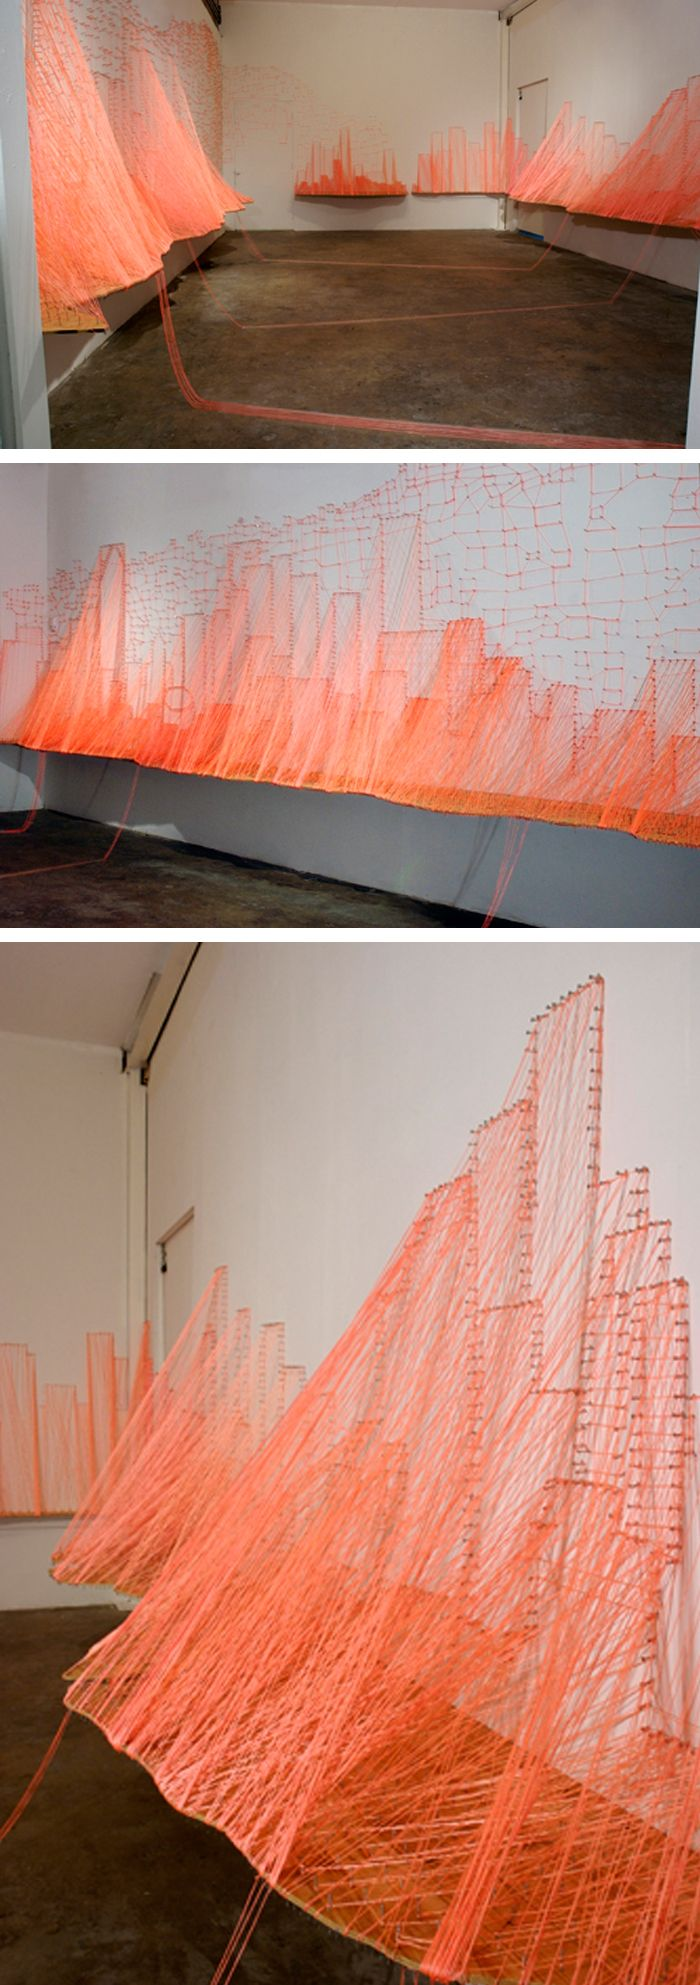 Aili Schmeltz - The Magic City String Art Installation